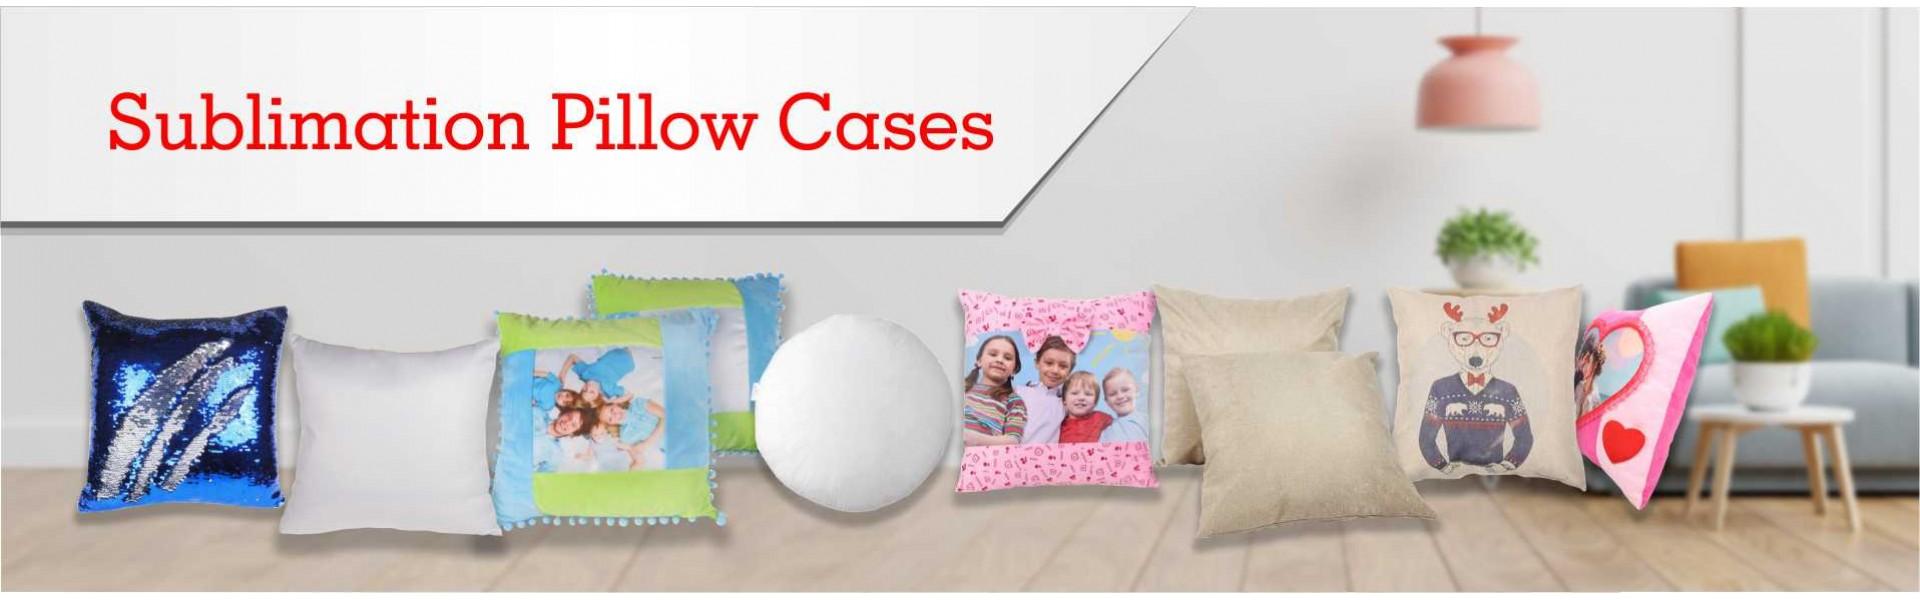 Sublimation Pillow Cases